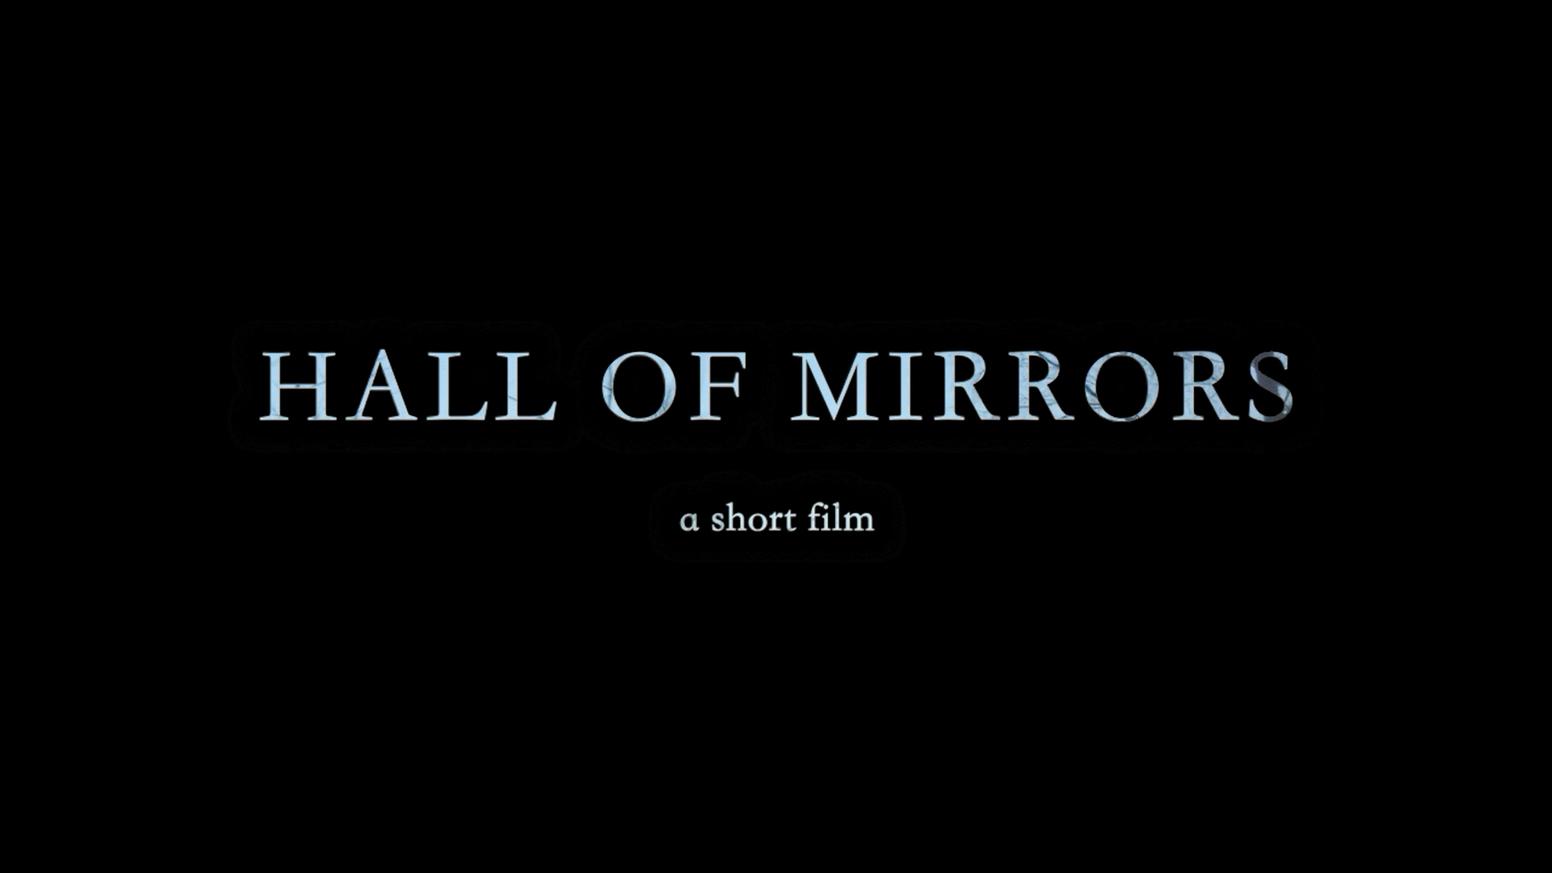 Hall of Mirrors by Andrew Koji